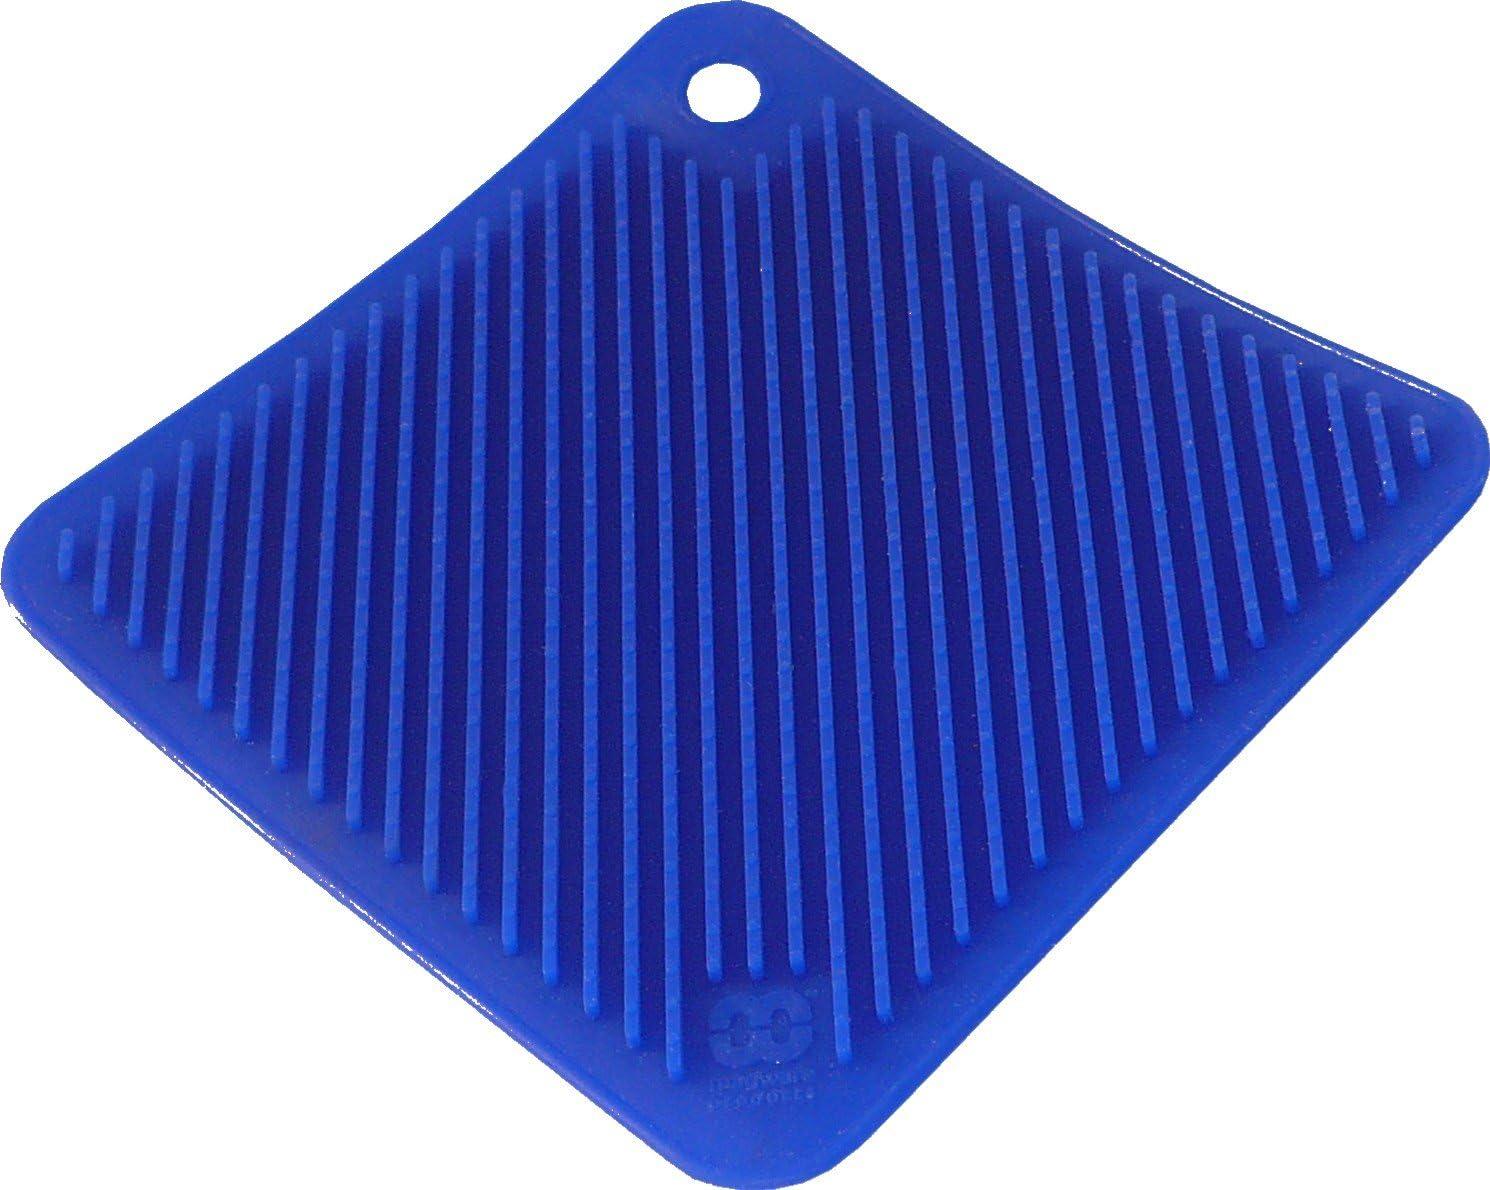 So-Cool Silicone Pot Holder/Trivet, Dark Blue